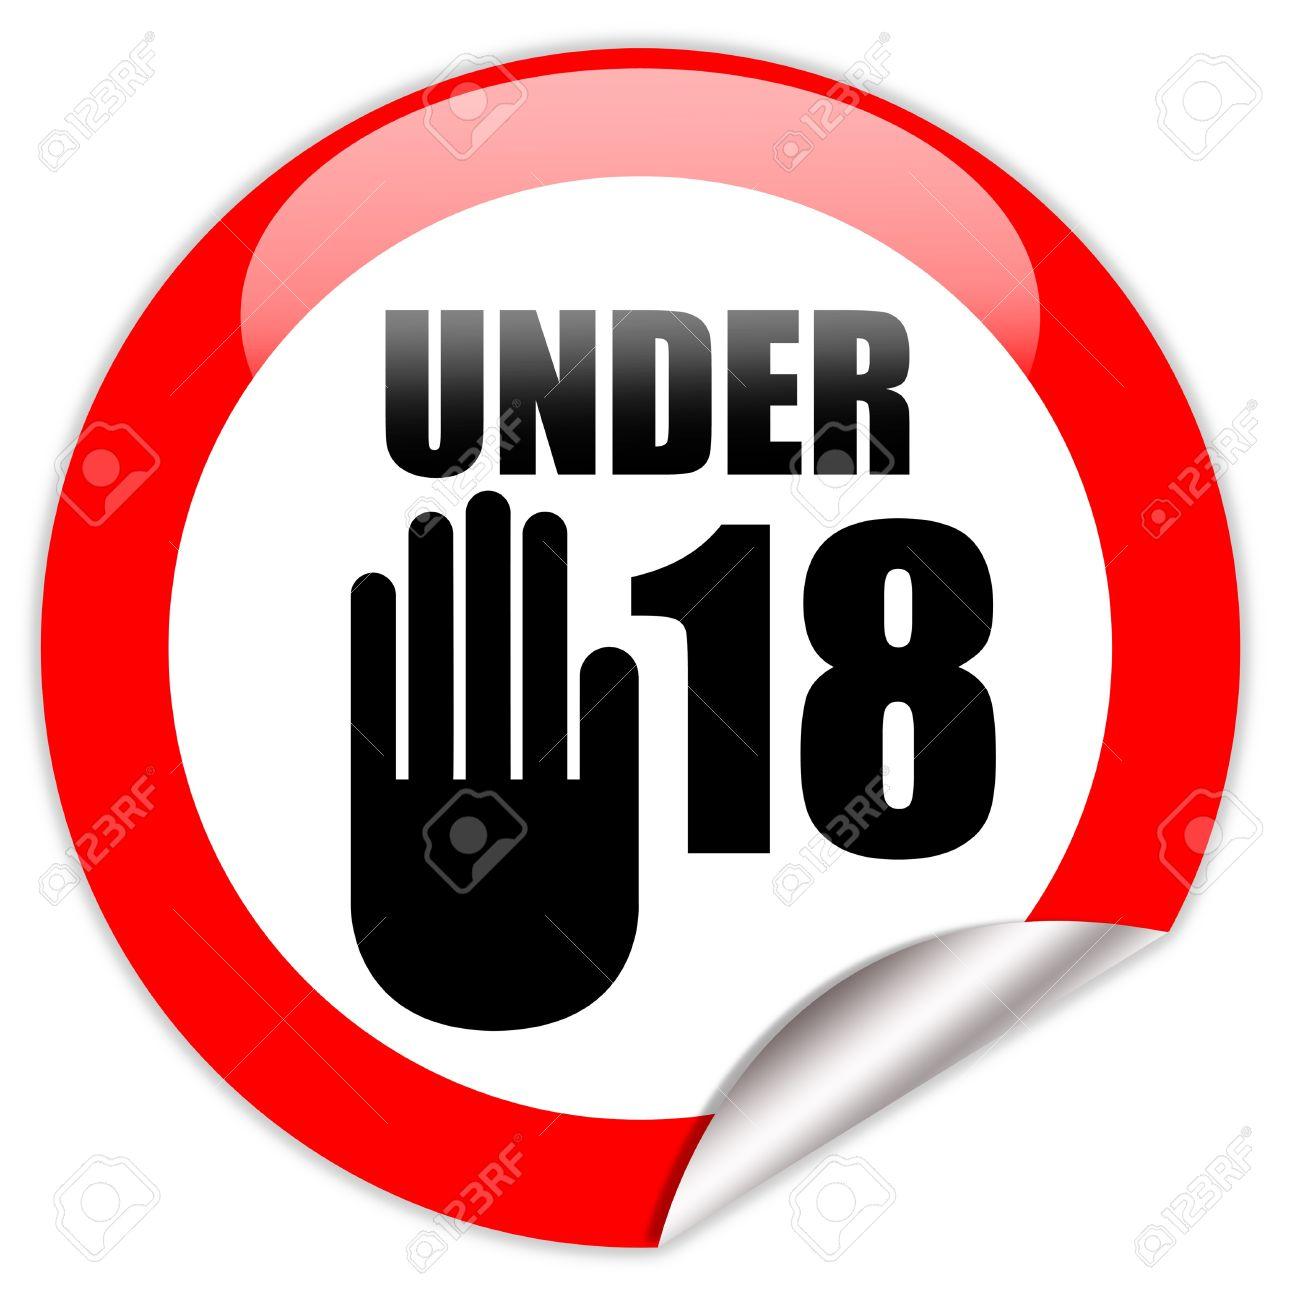 Under eighteen sign Stock Photo - 9849783